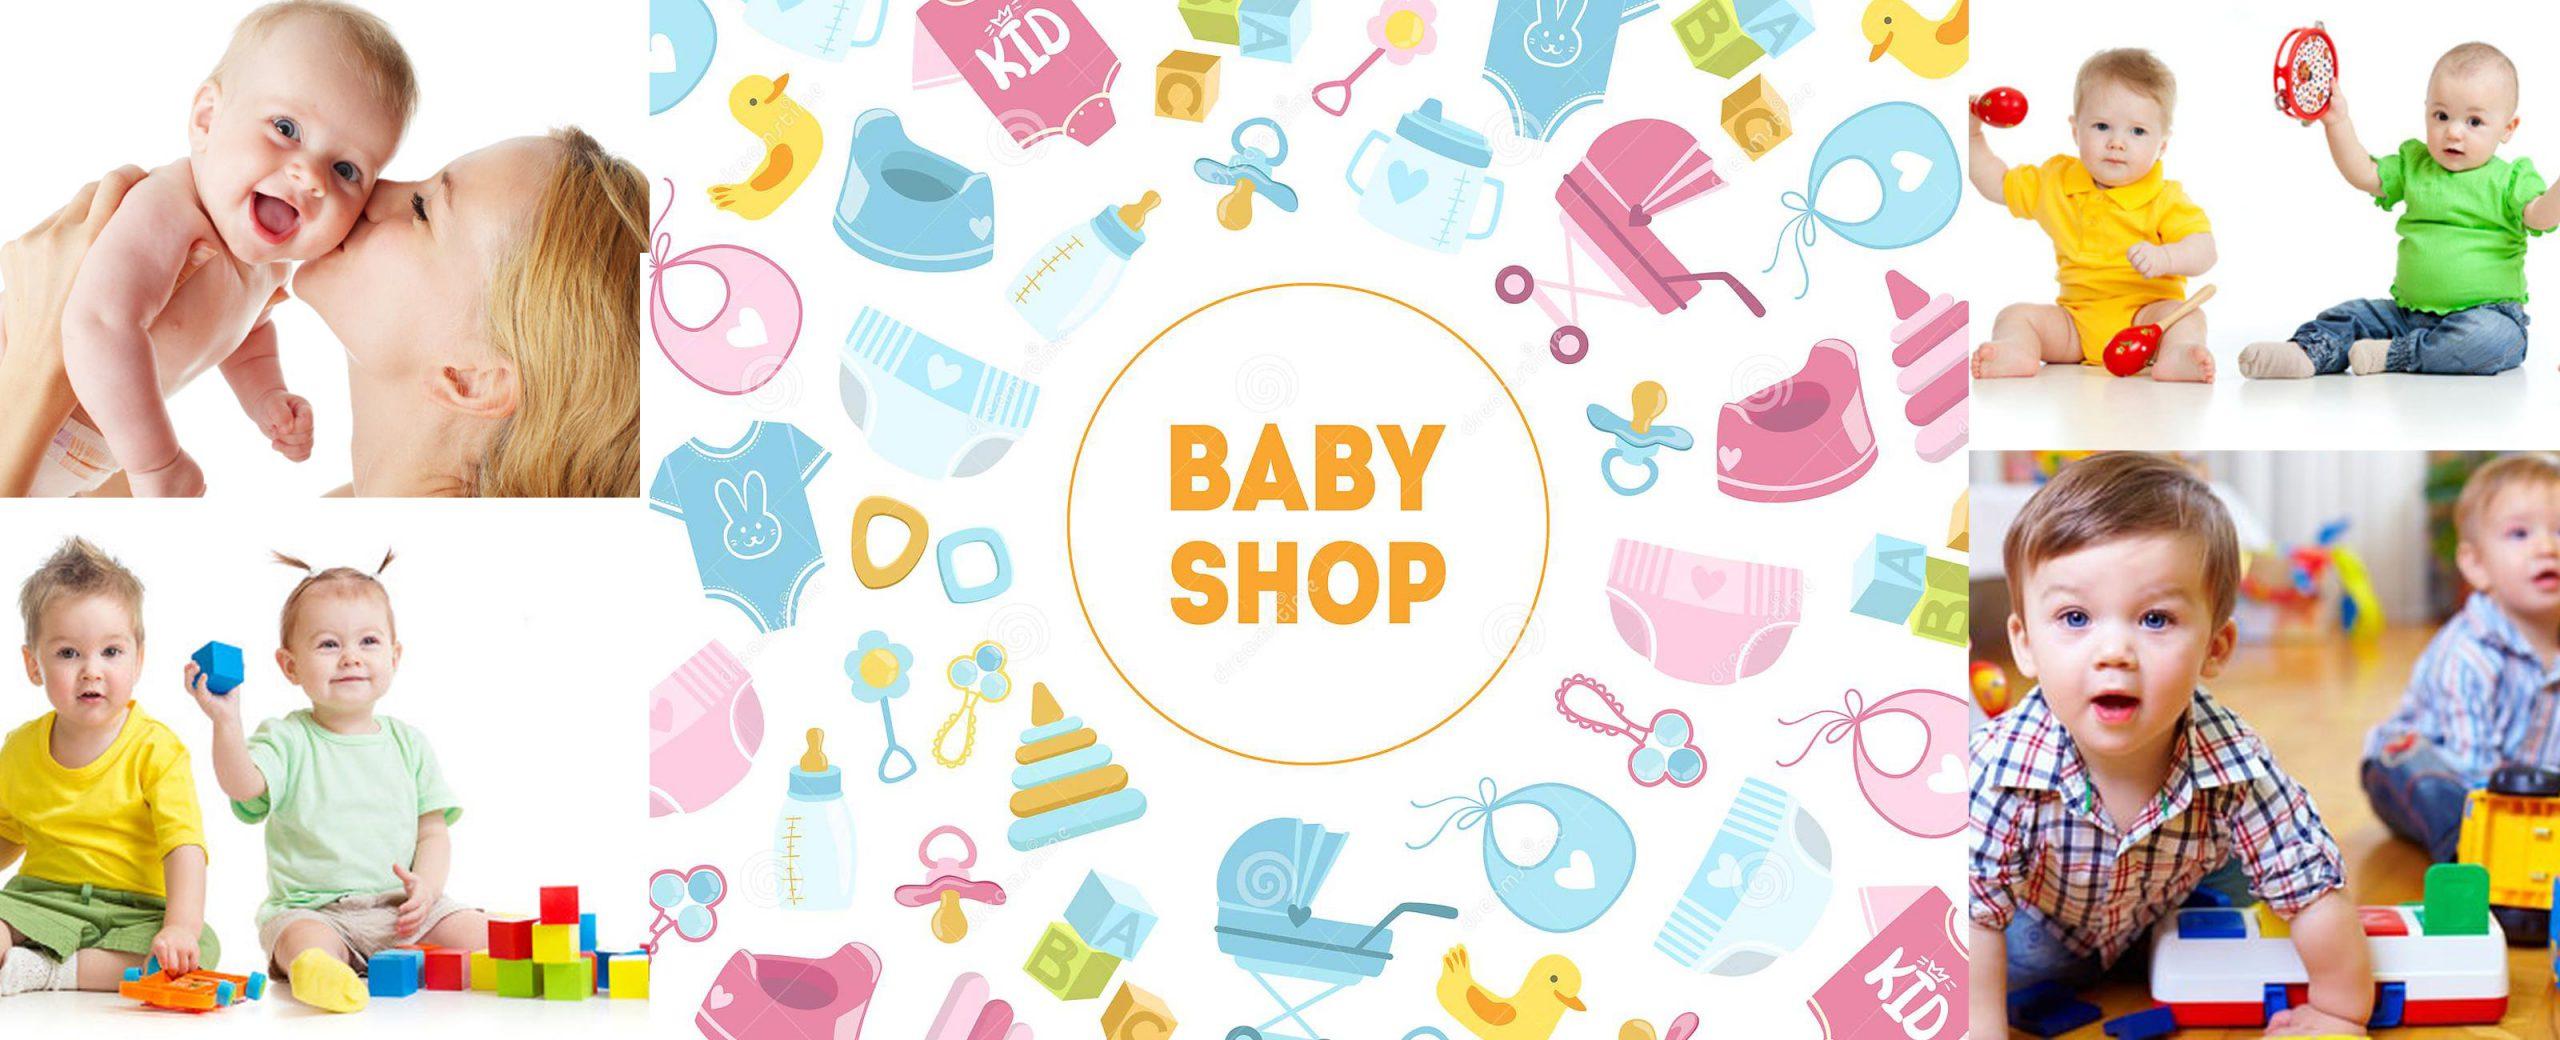 baby online shopping in pakistan